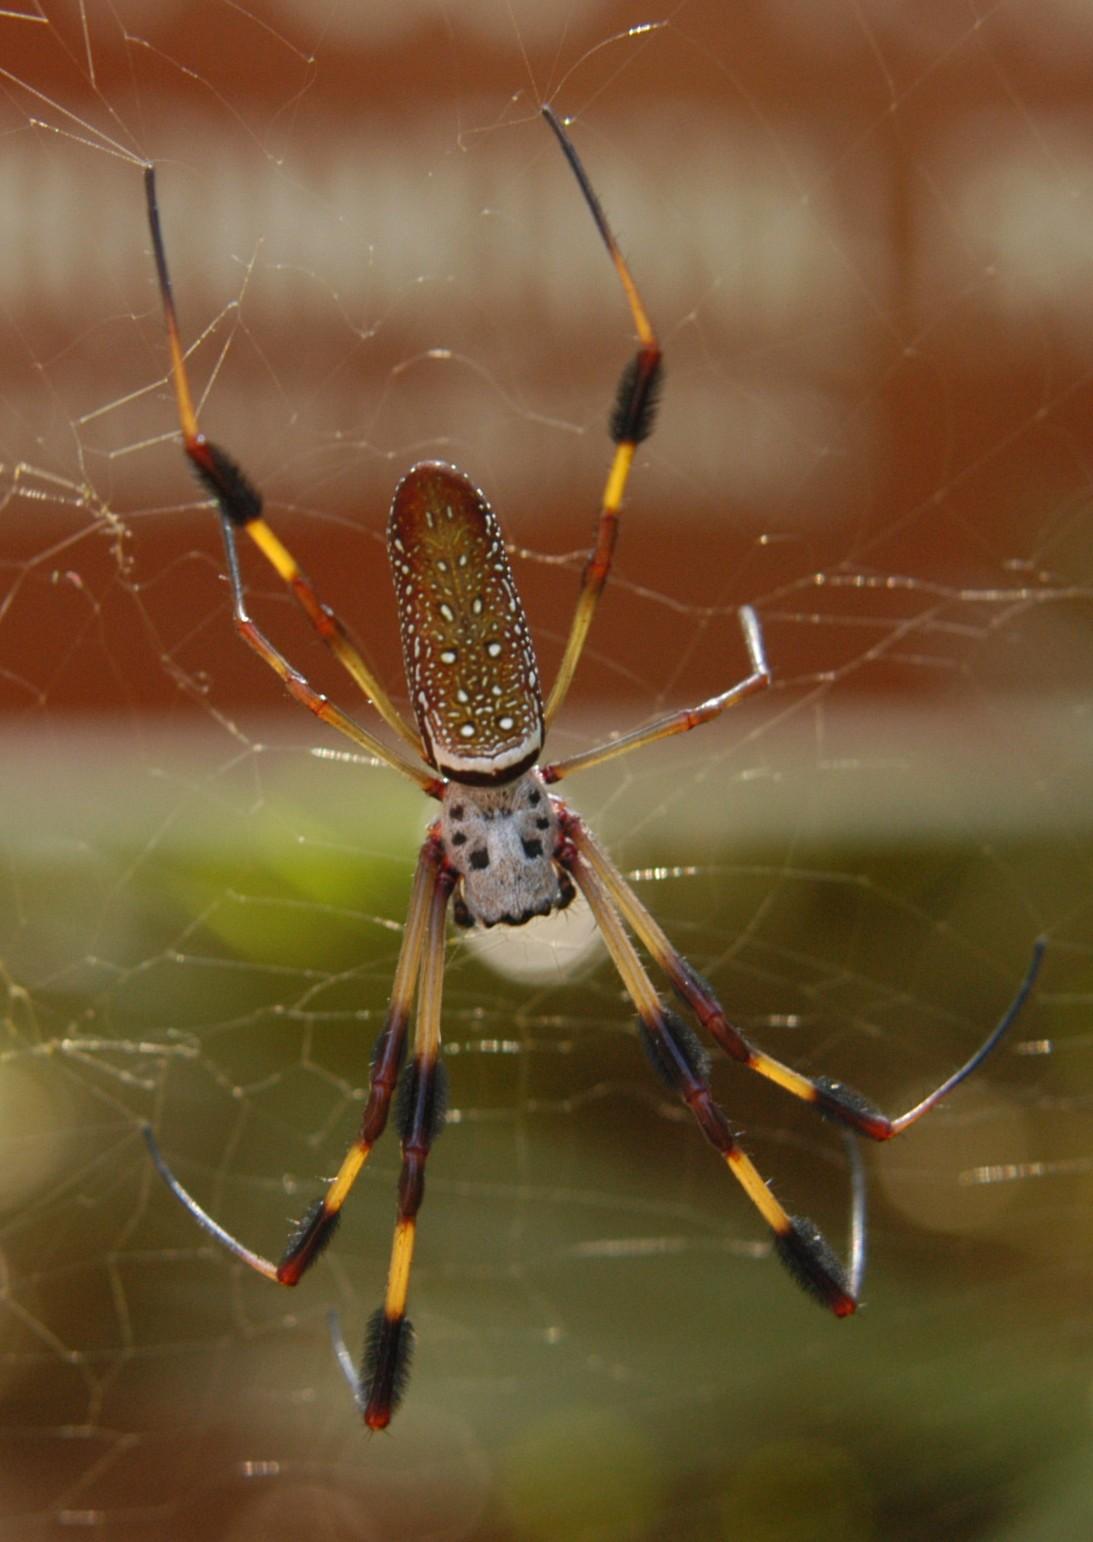 File:Misha3637 - banana spider (by).jpg - Wikimedia Commons